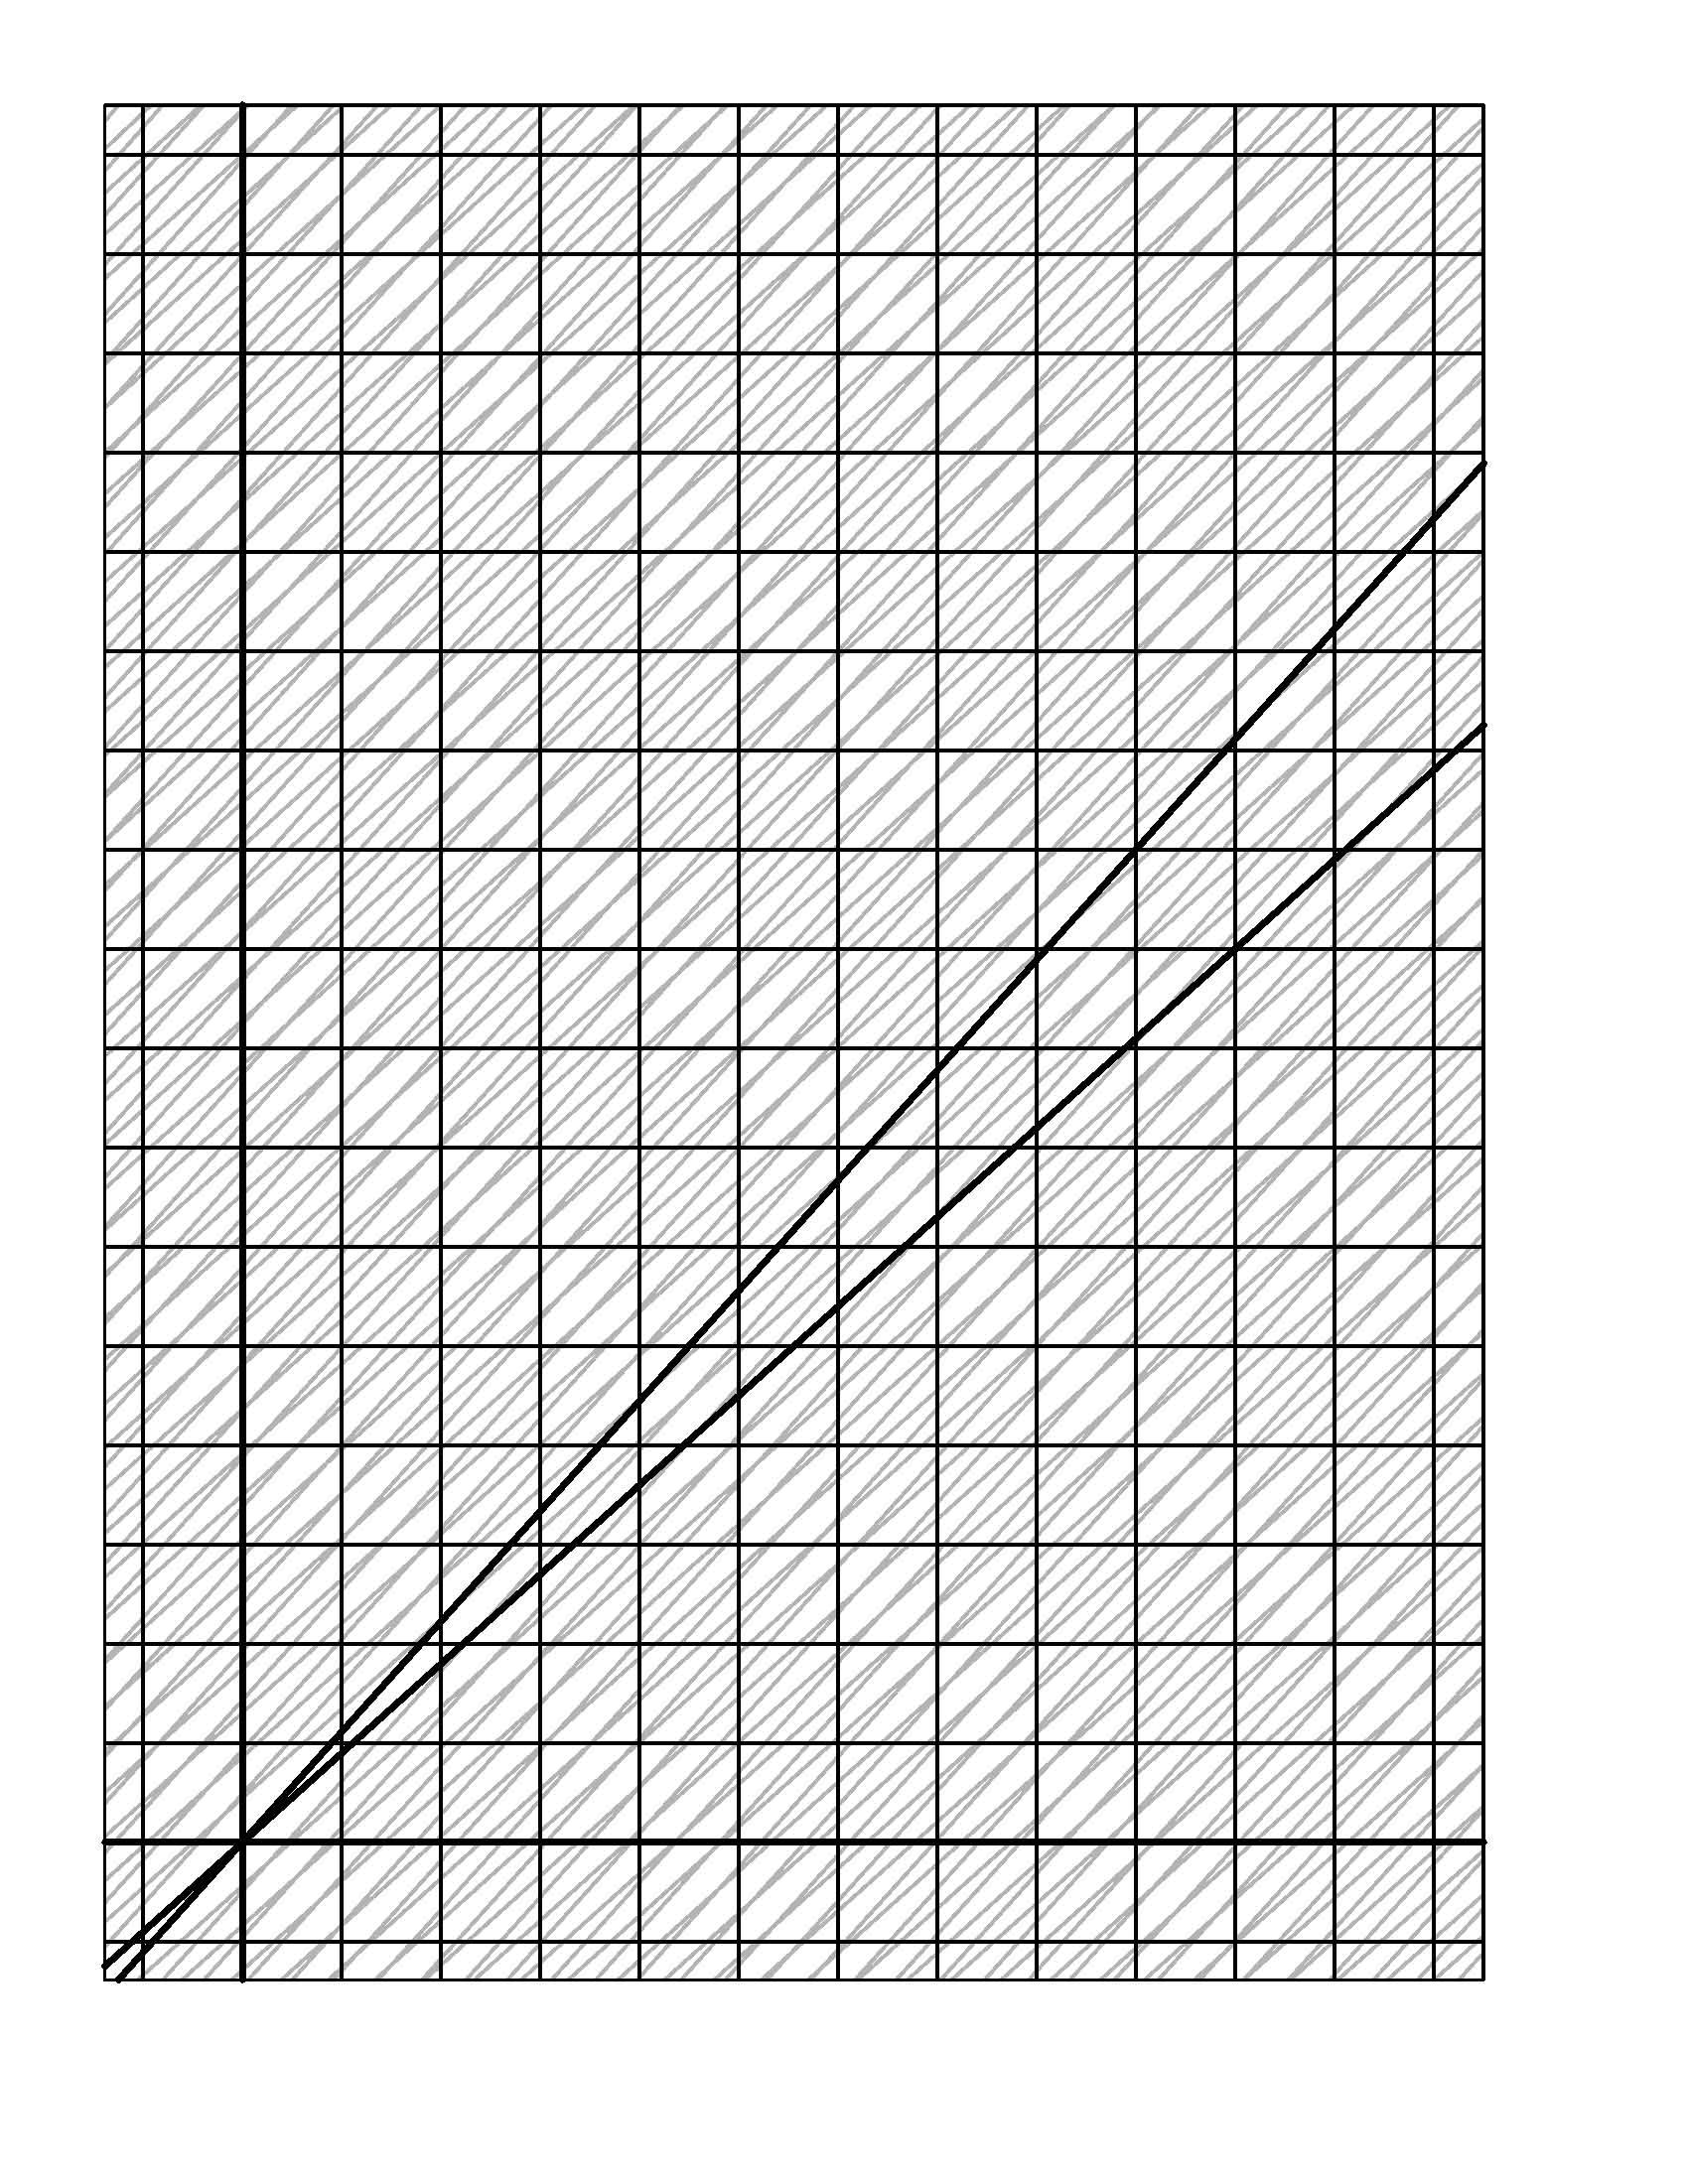 galilean principle of relativity pdf